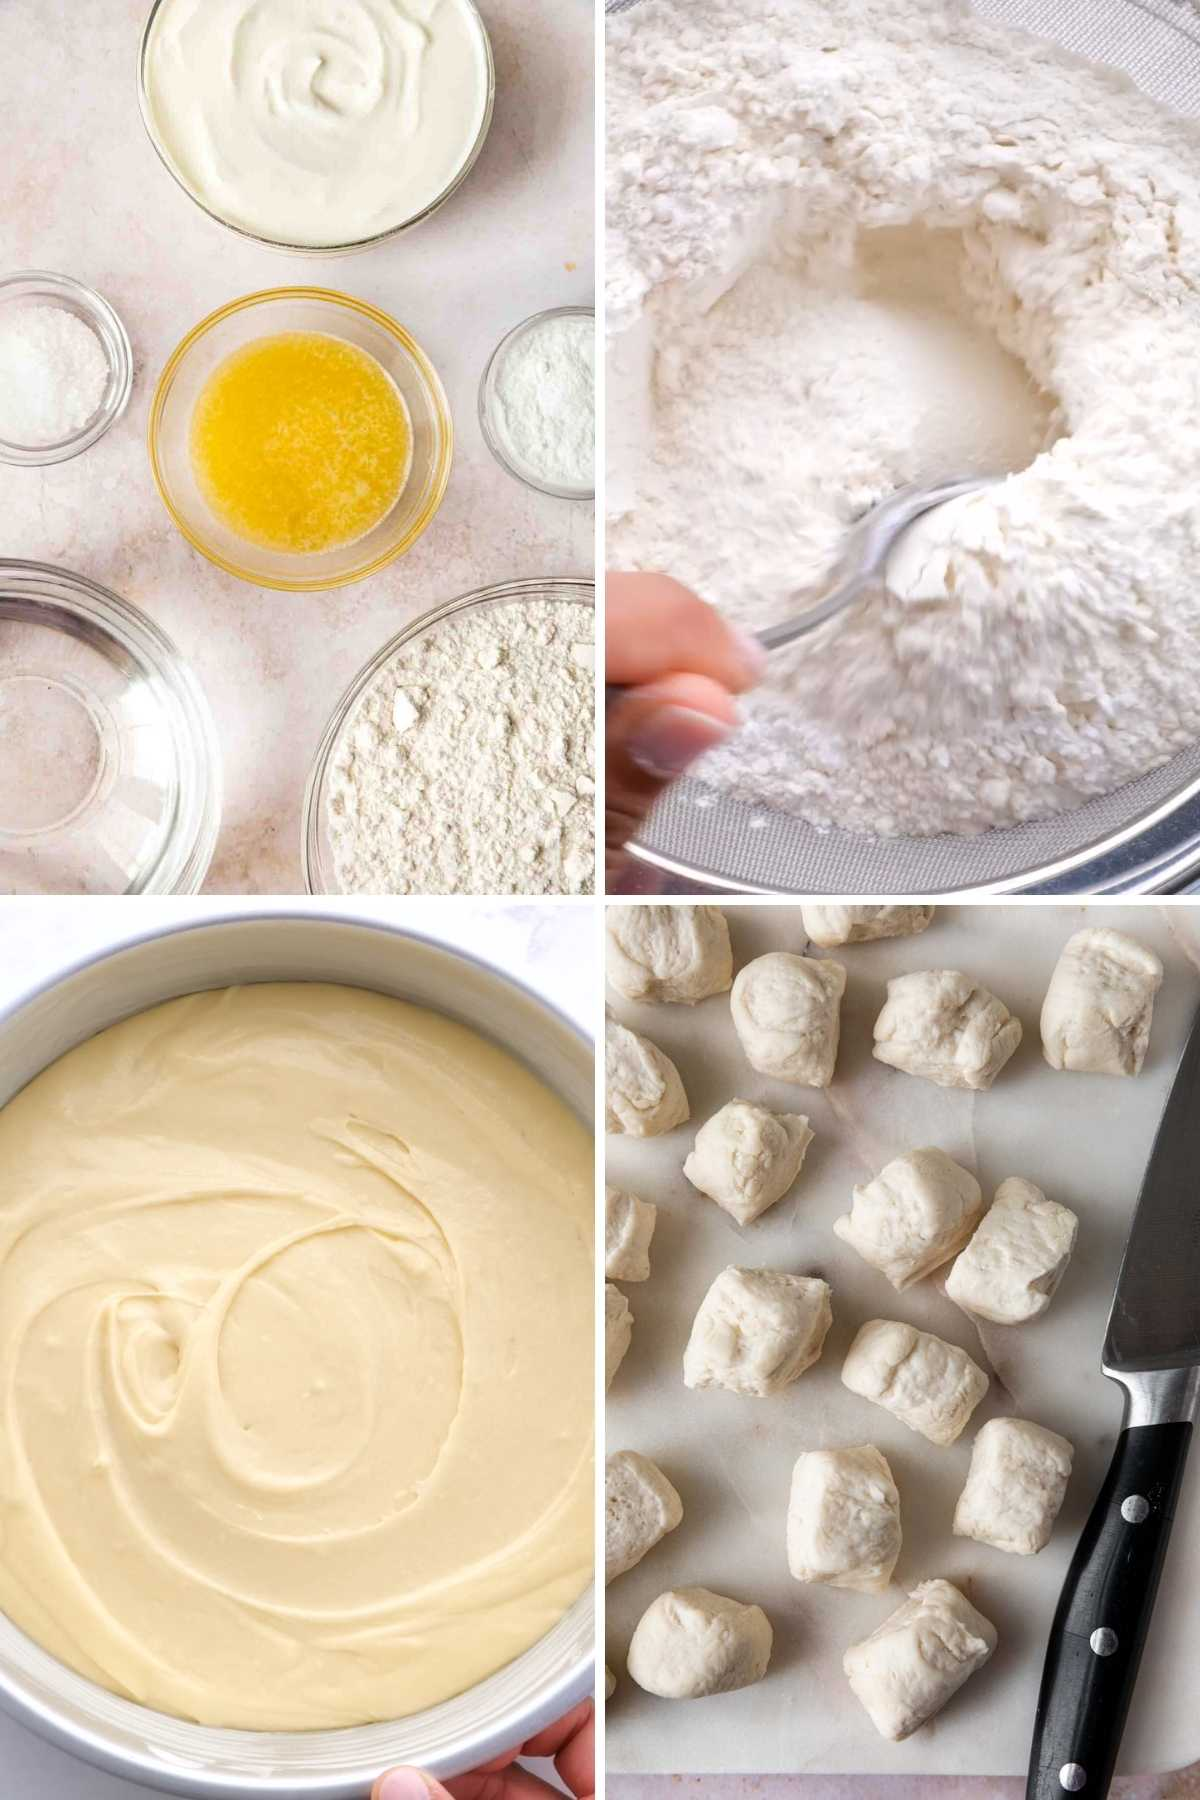 Easy Pretzel Bites collage of prep steps for making dough